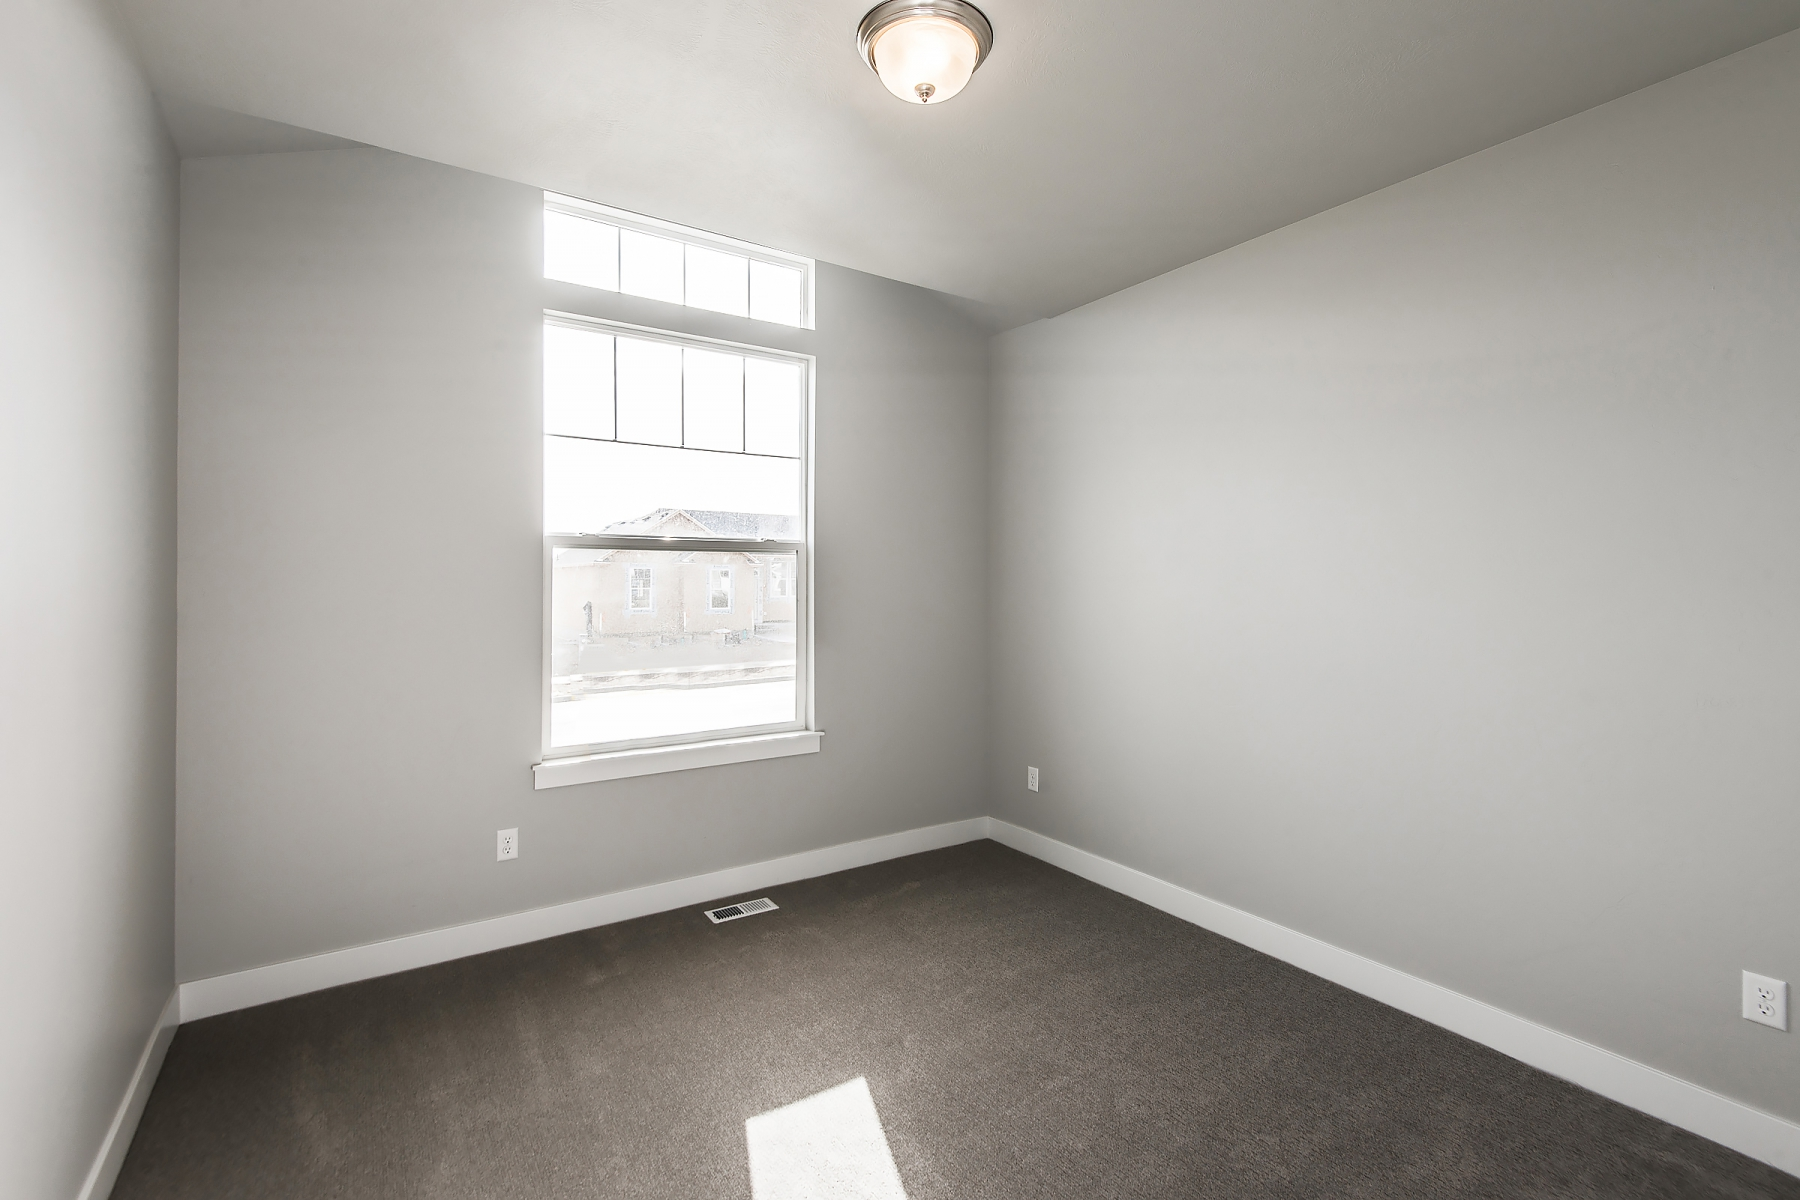 Bedroom-Four_1800x1200_2109728